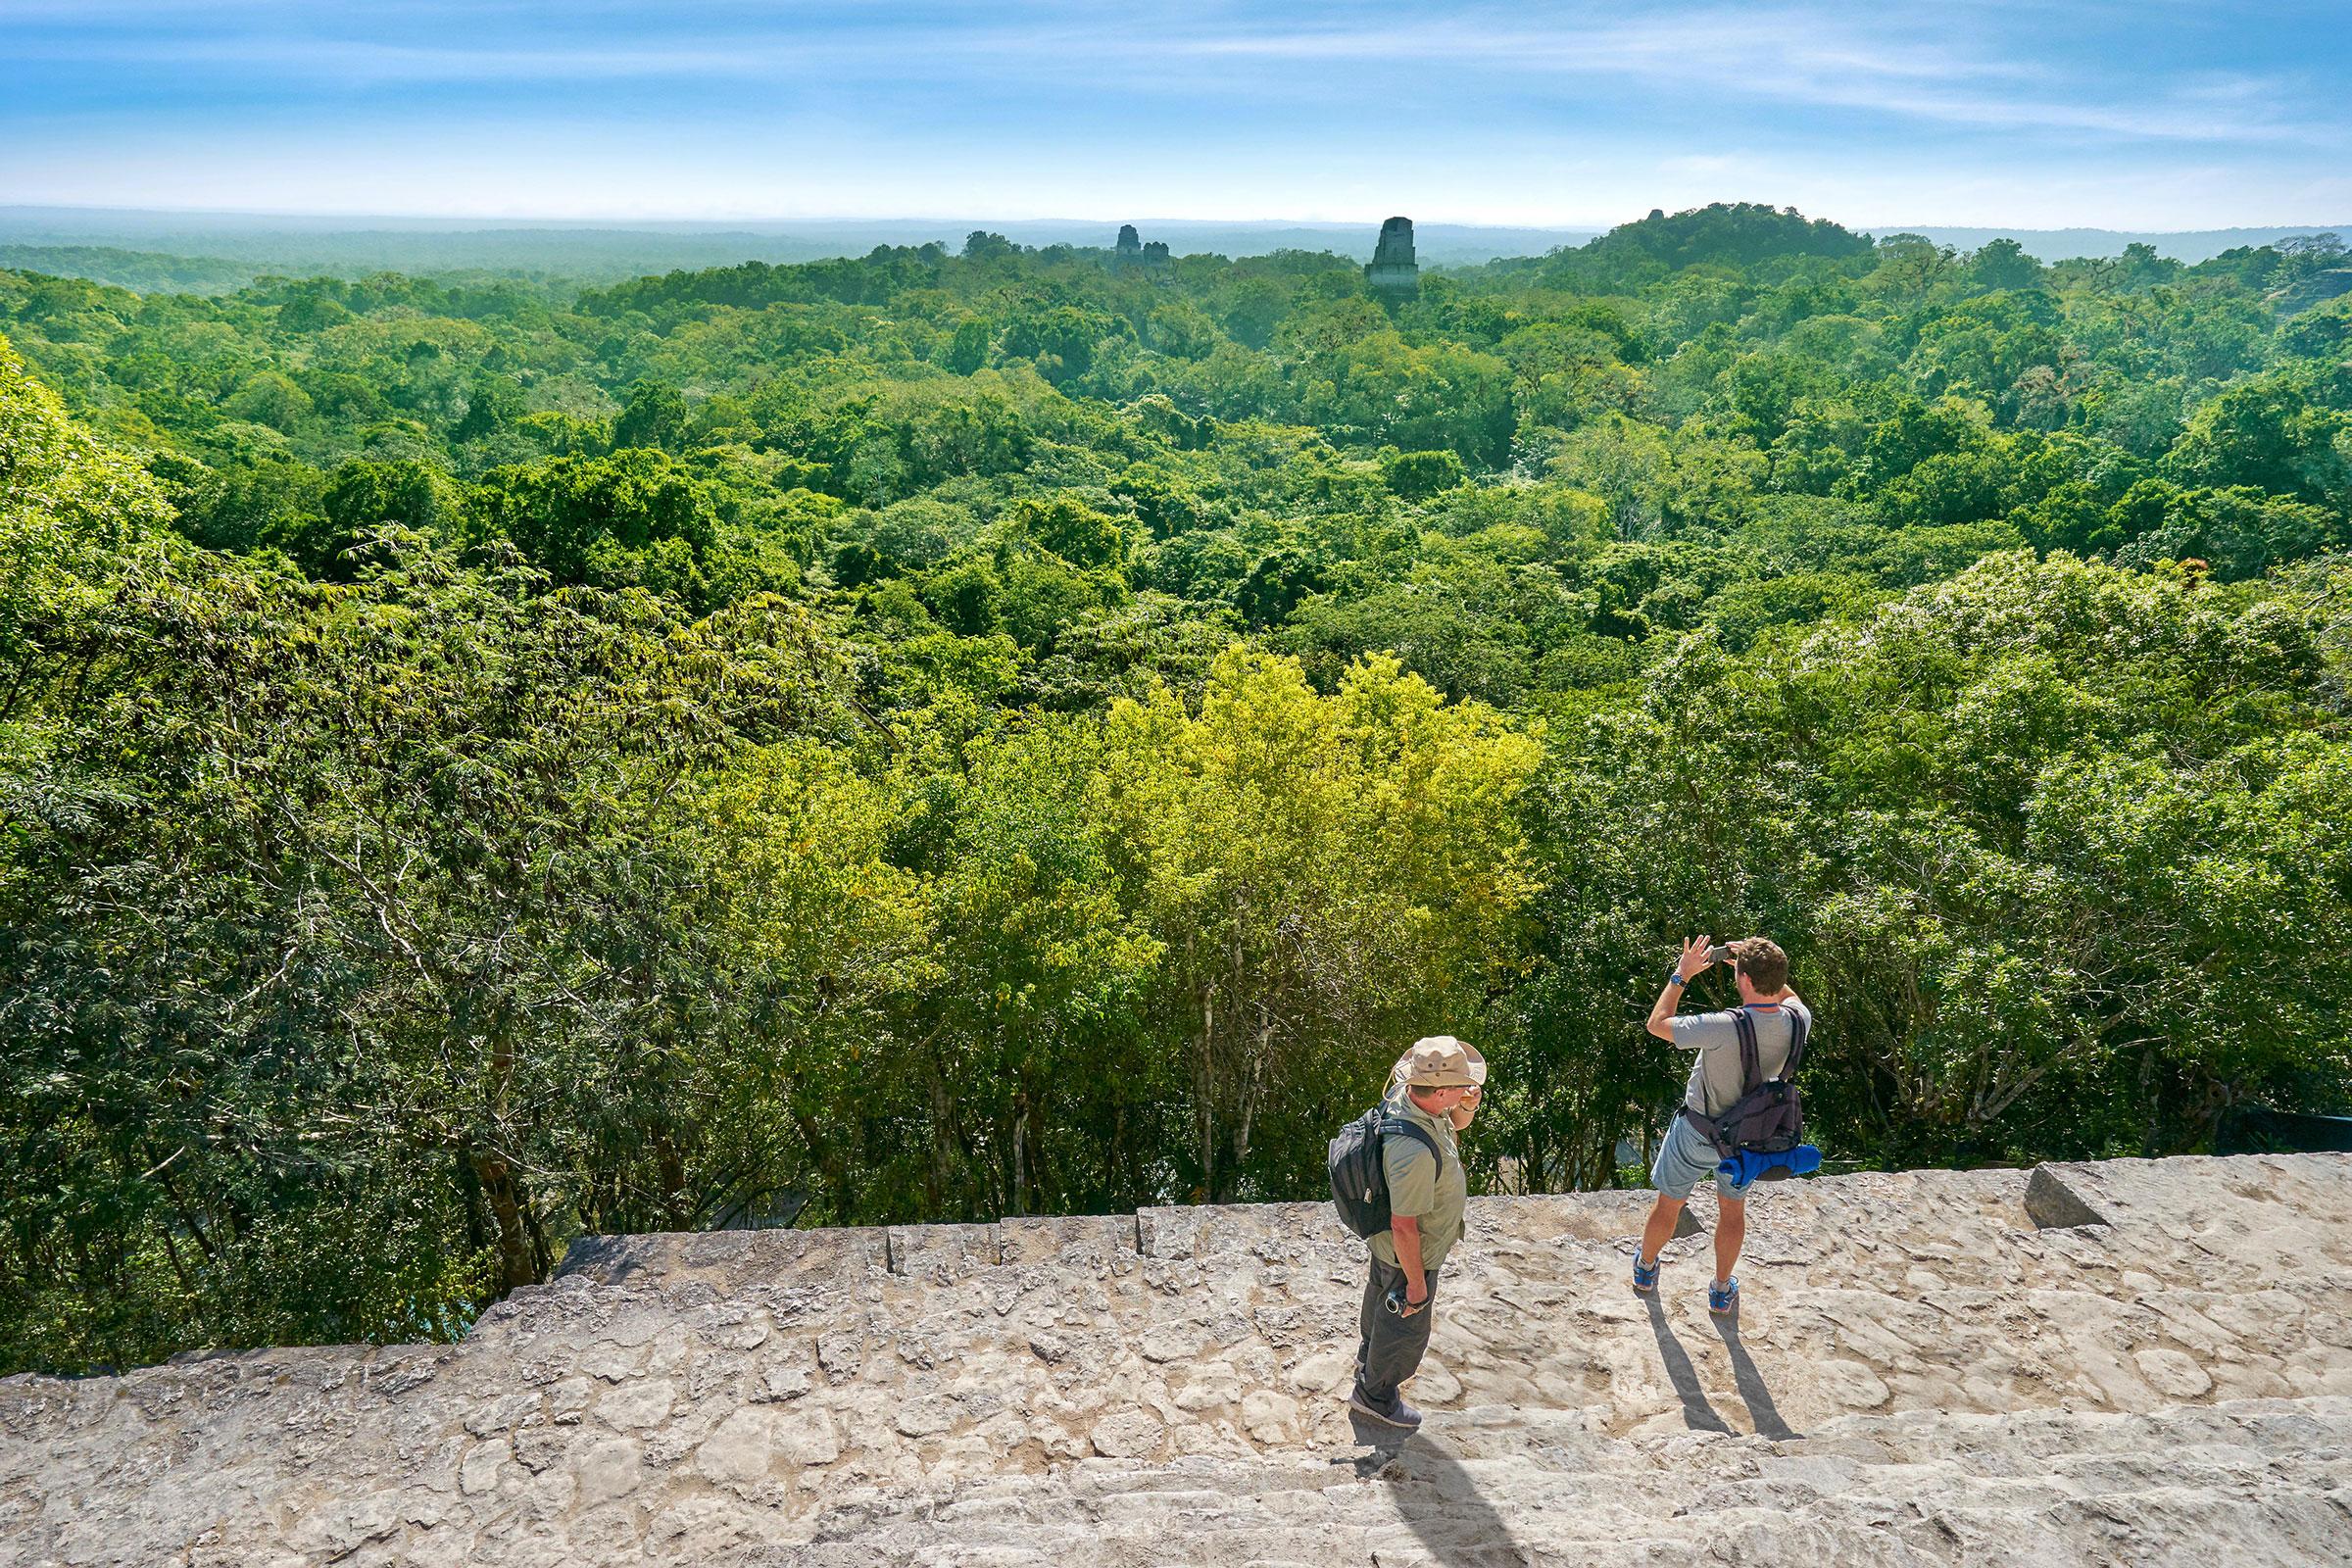 Tourists on the top of Temple IV, Ancient Maya Ruins, Tikal National Park, Yucatan, Guatemala. Jan Wlodarczyk/Alamy